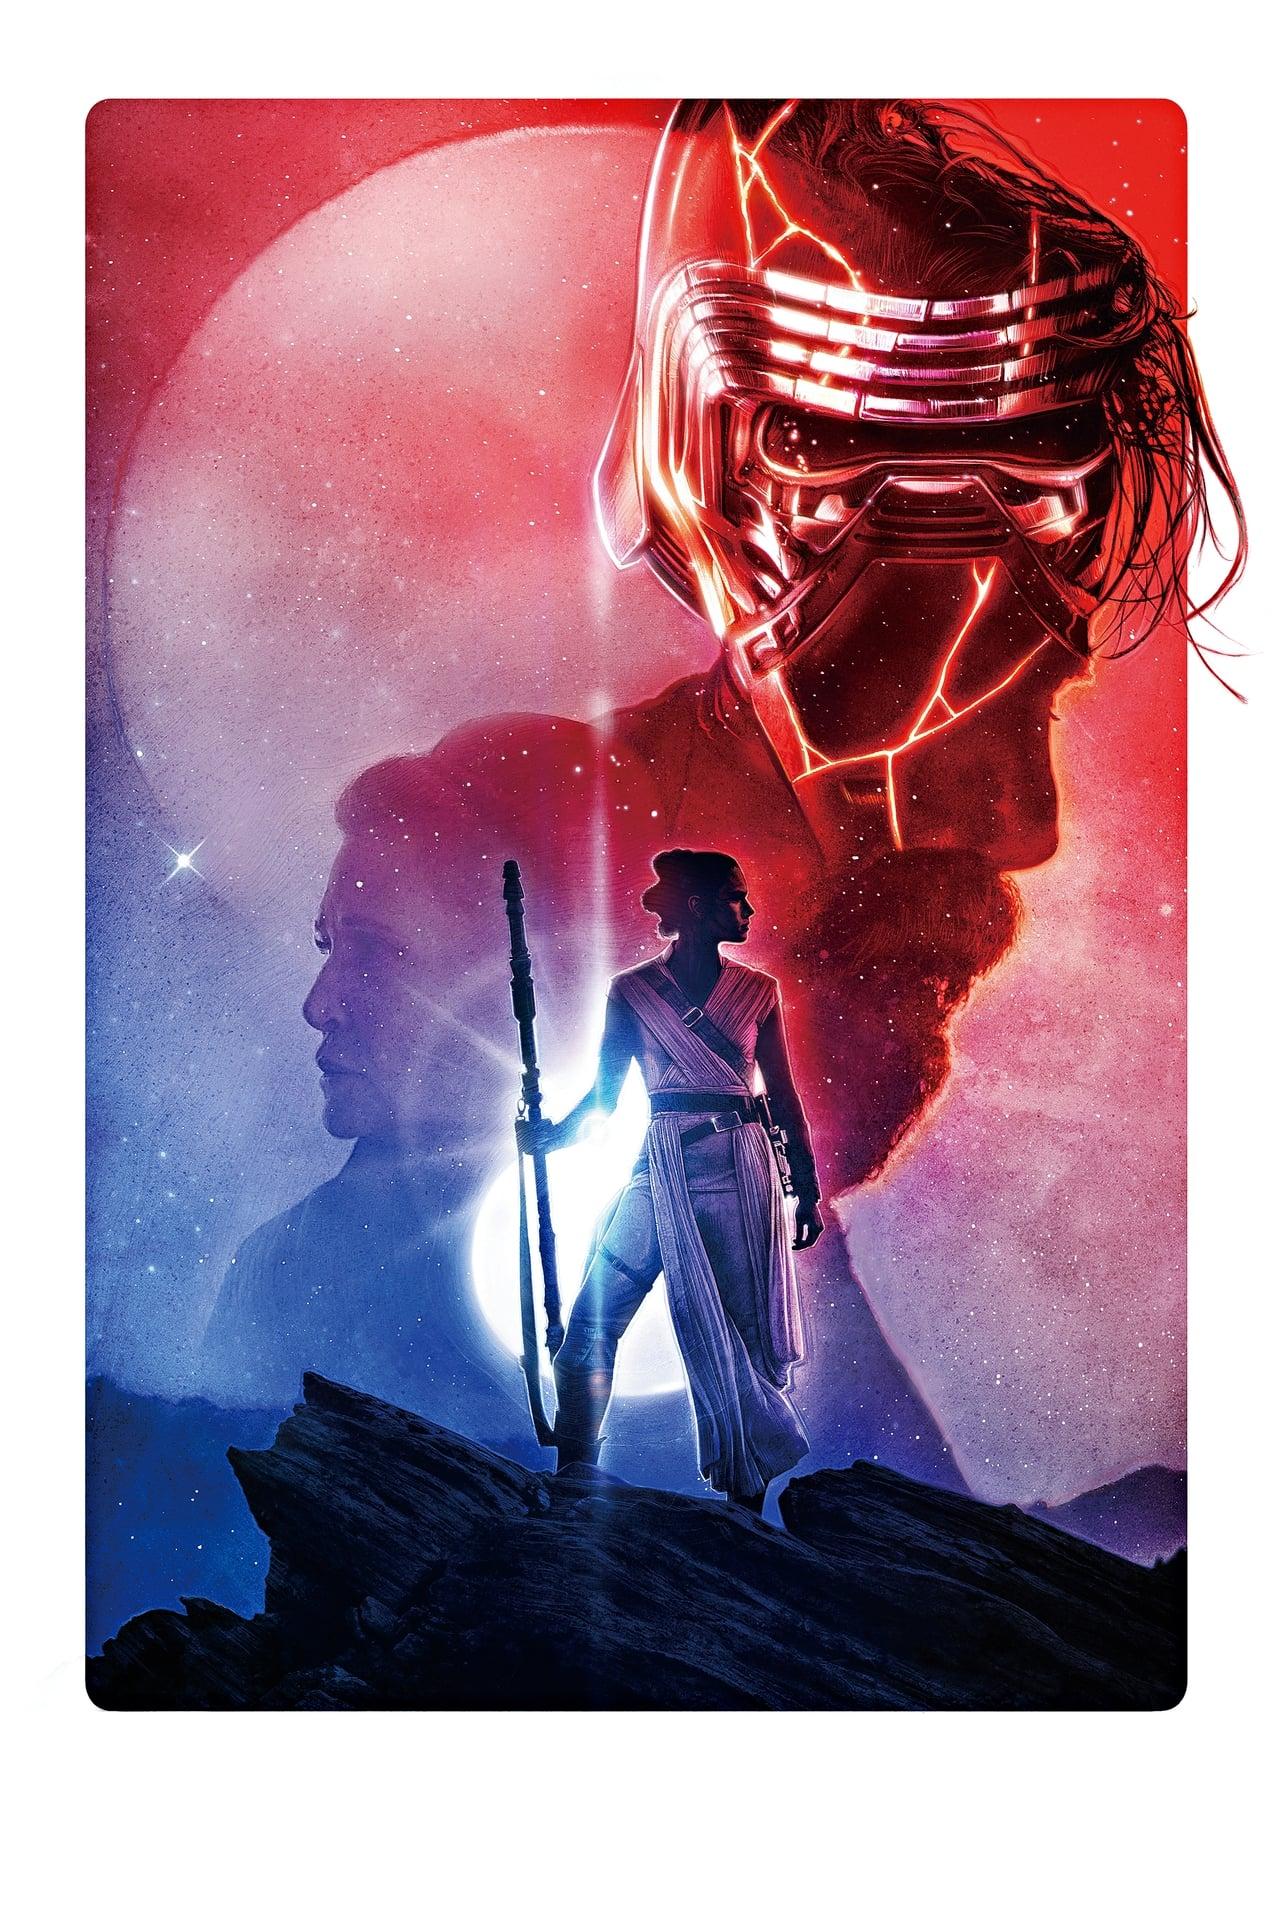 Google Drive Full Star Wars The Rise Of Skywalker 2019 Adam Driver Film Putlocker Star Wars Ix 2019 Google Docs Over Blog Com